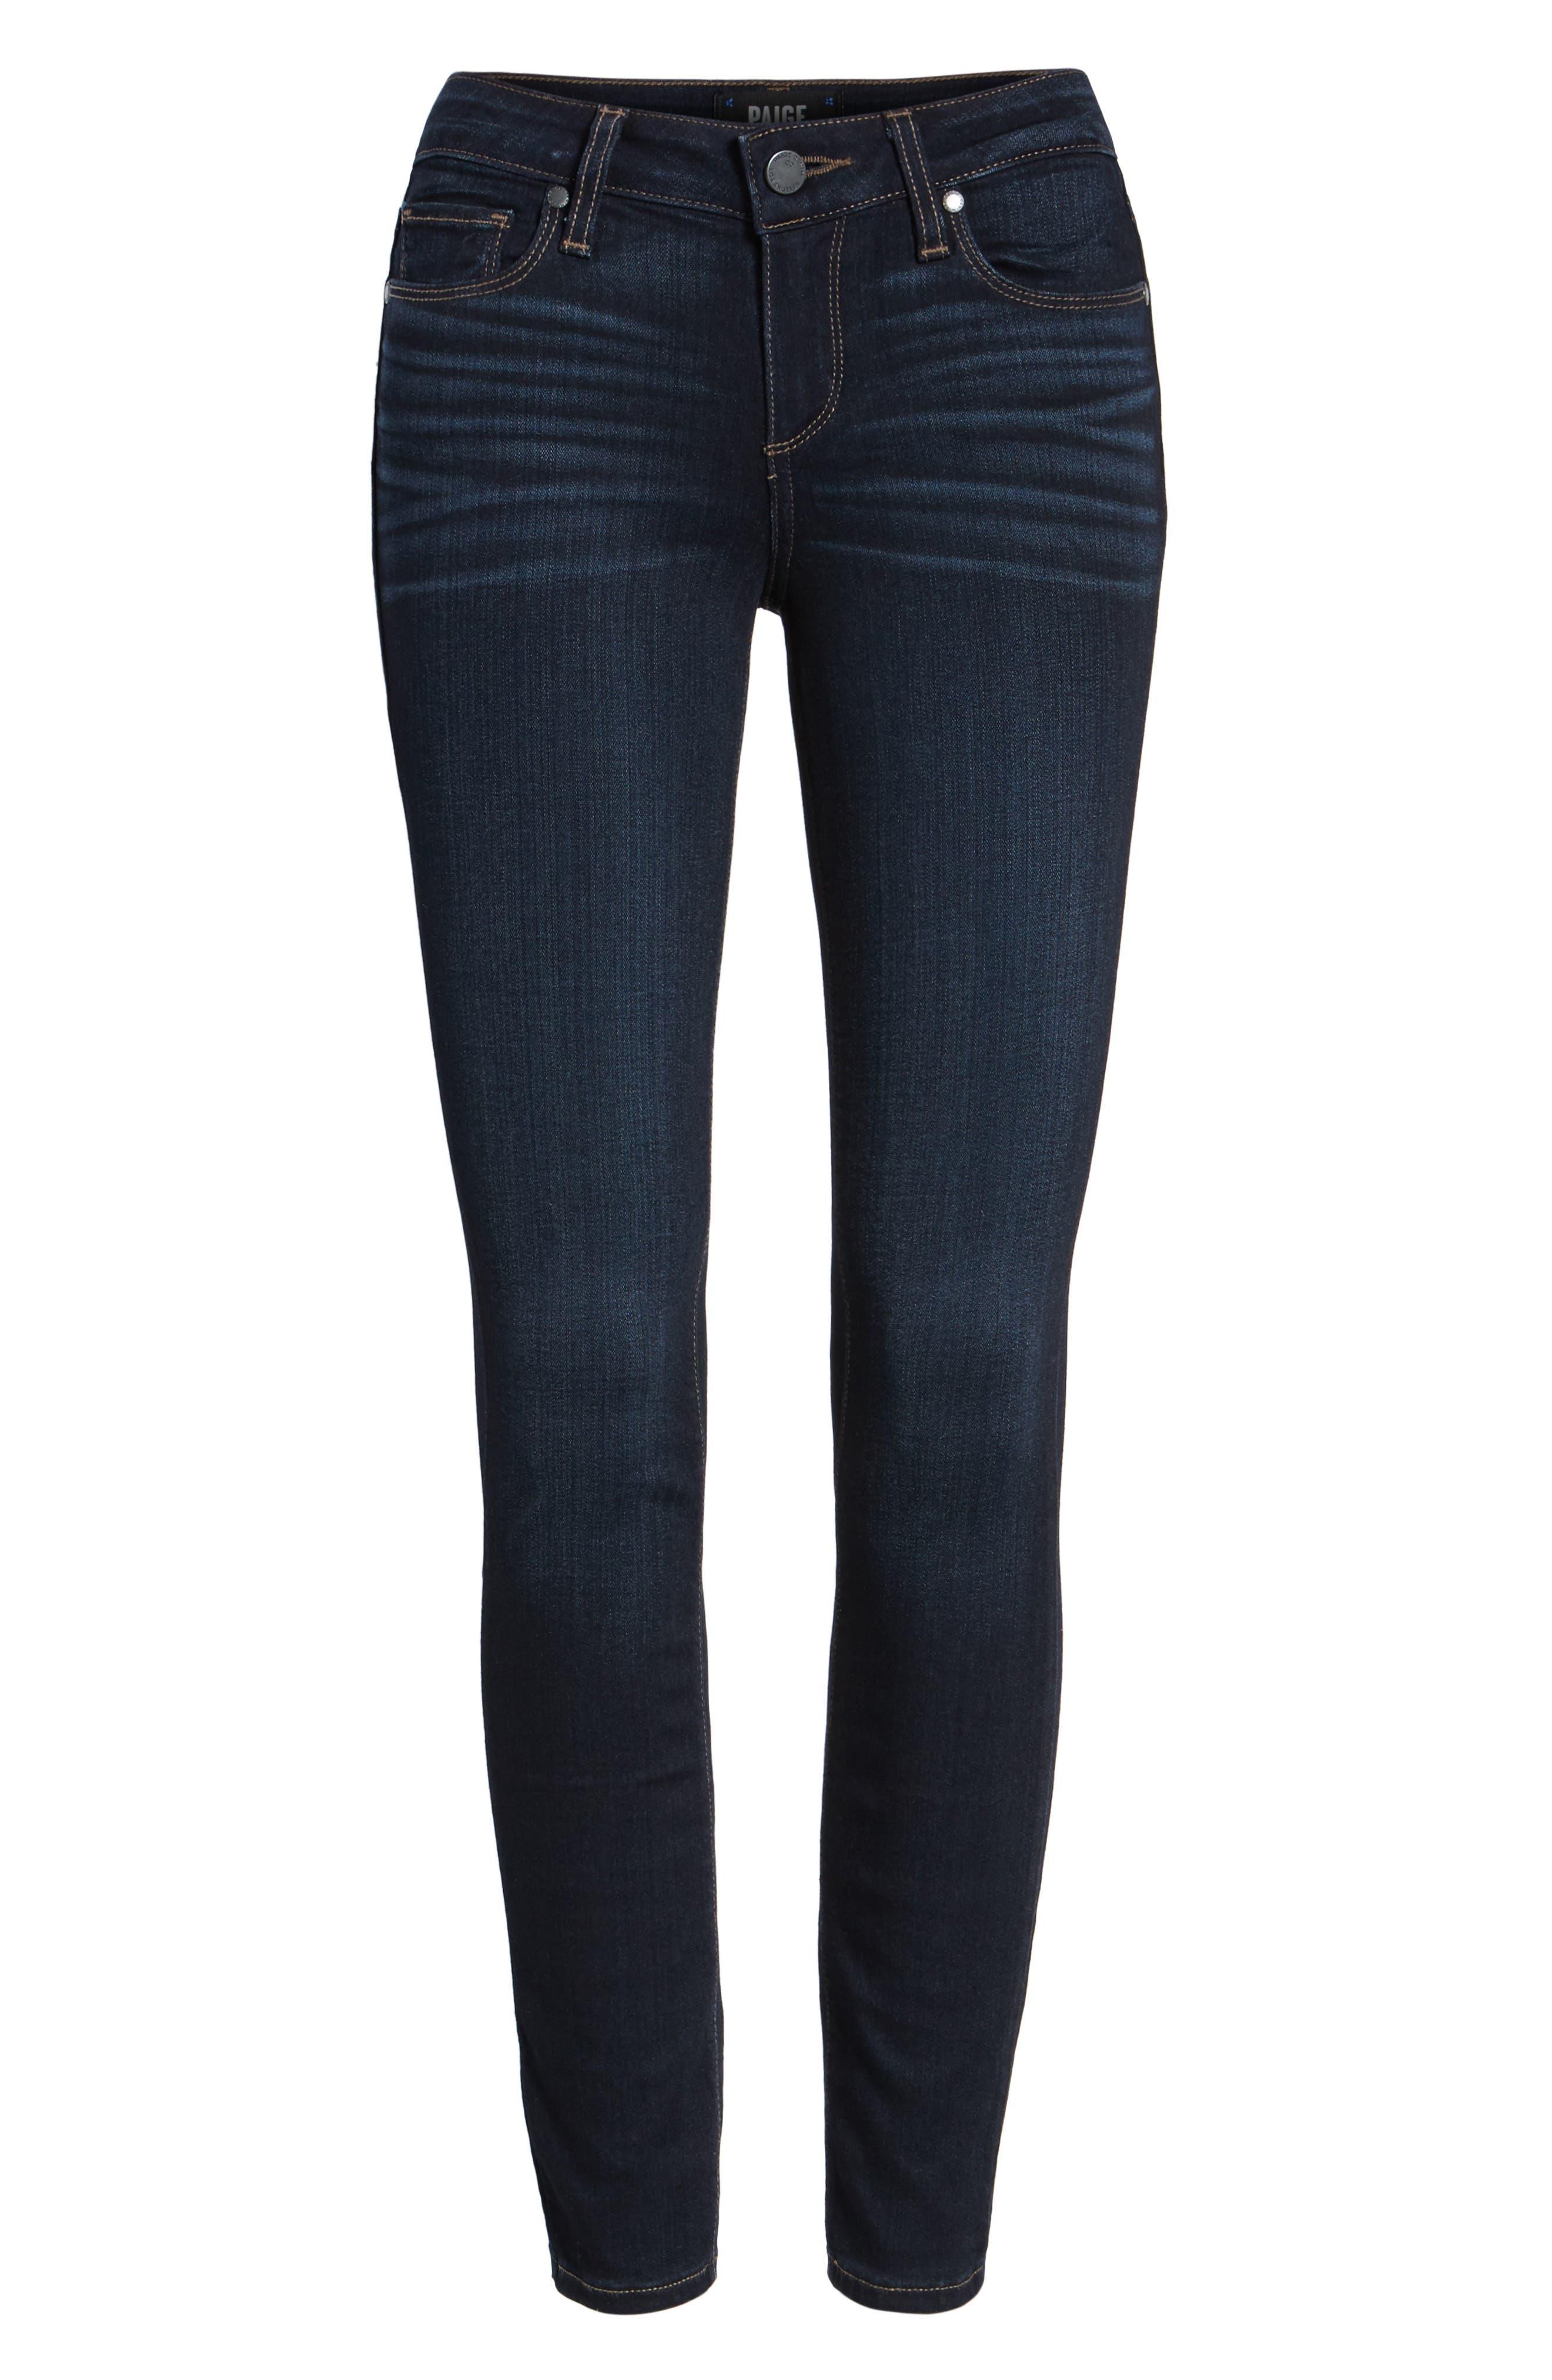 Transcend Verdugo Ankle Ultra Skinny Jeans,                             Main thumbnail 1, color,                             ELLORA